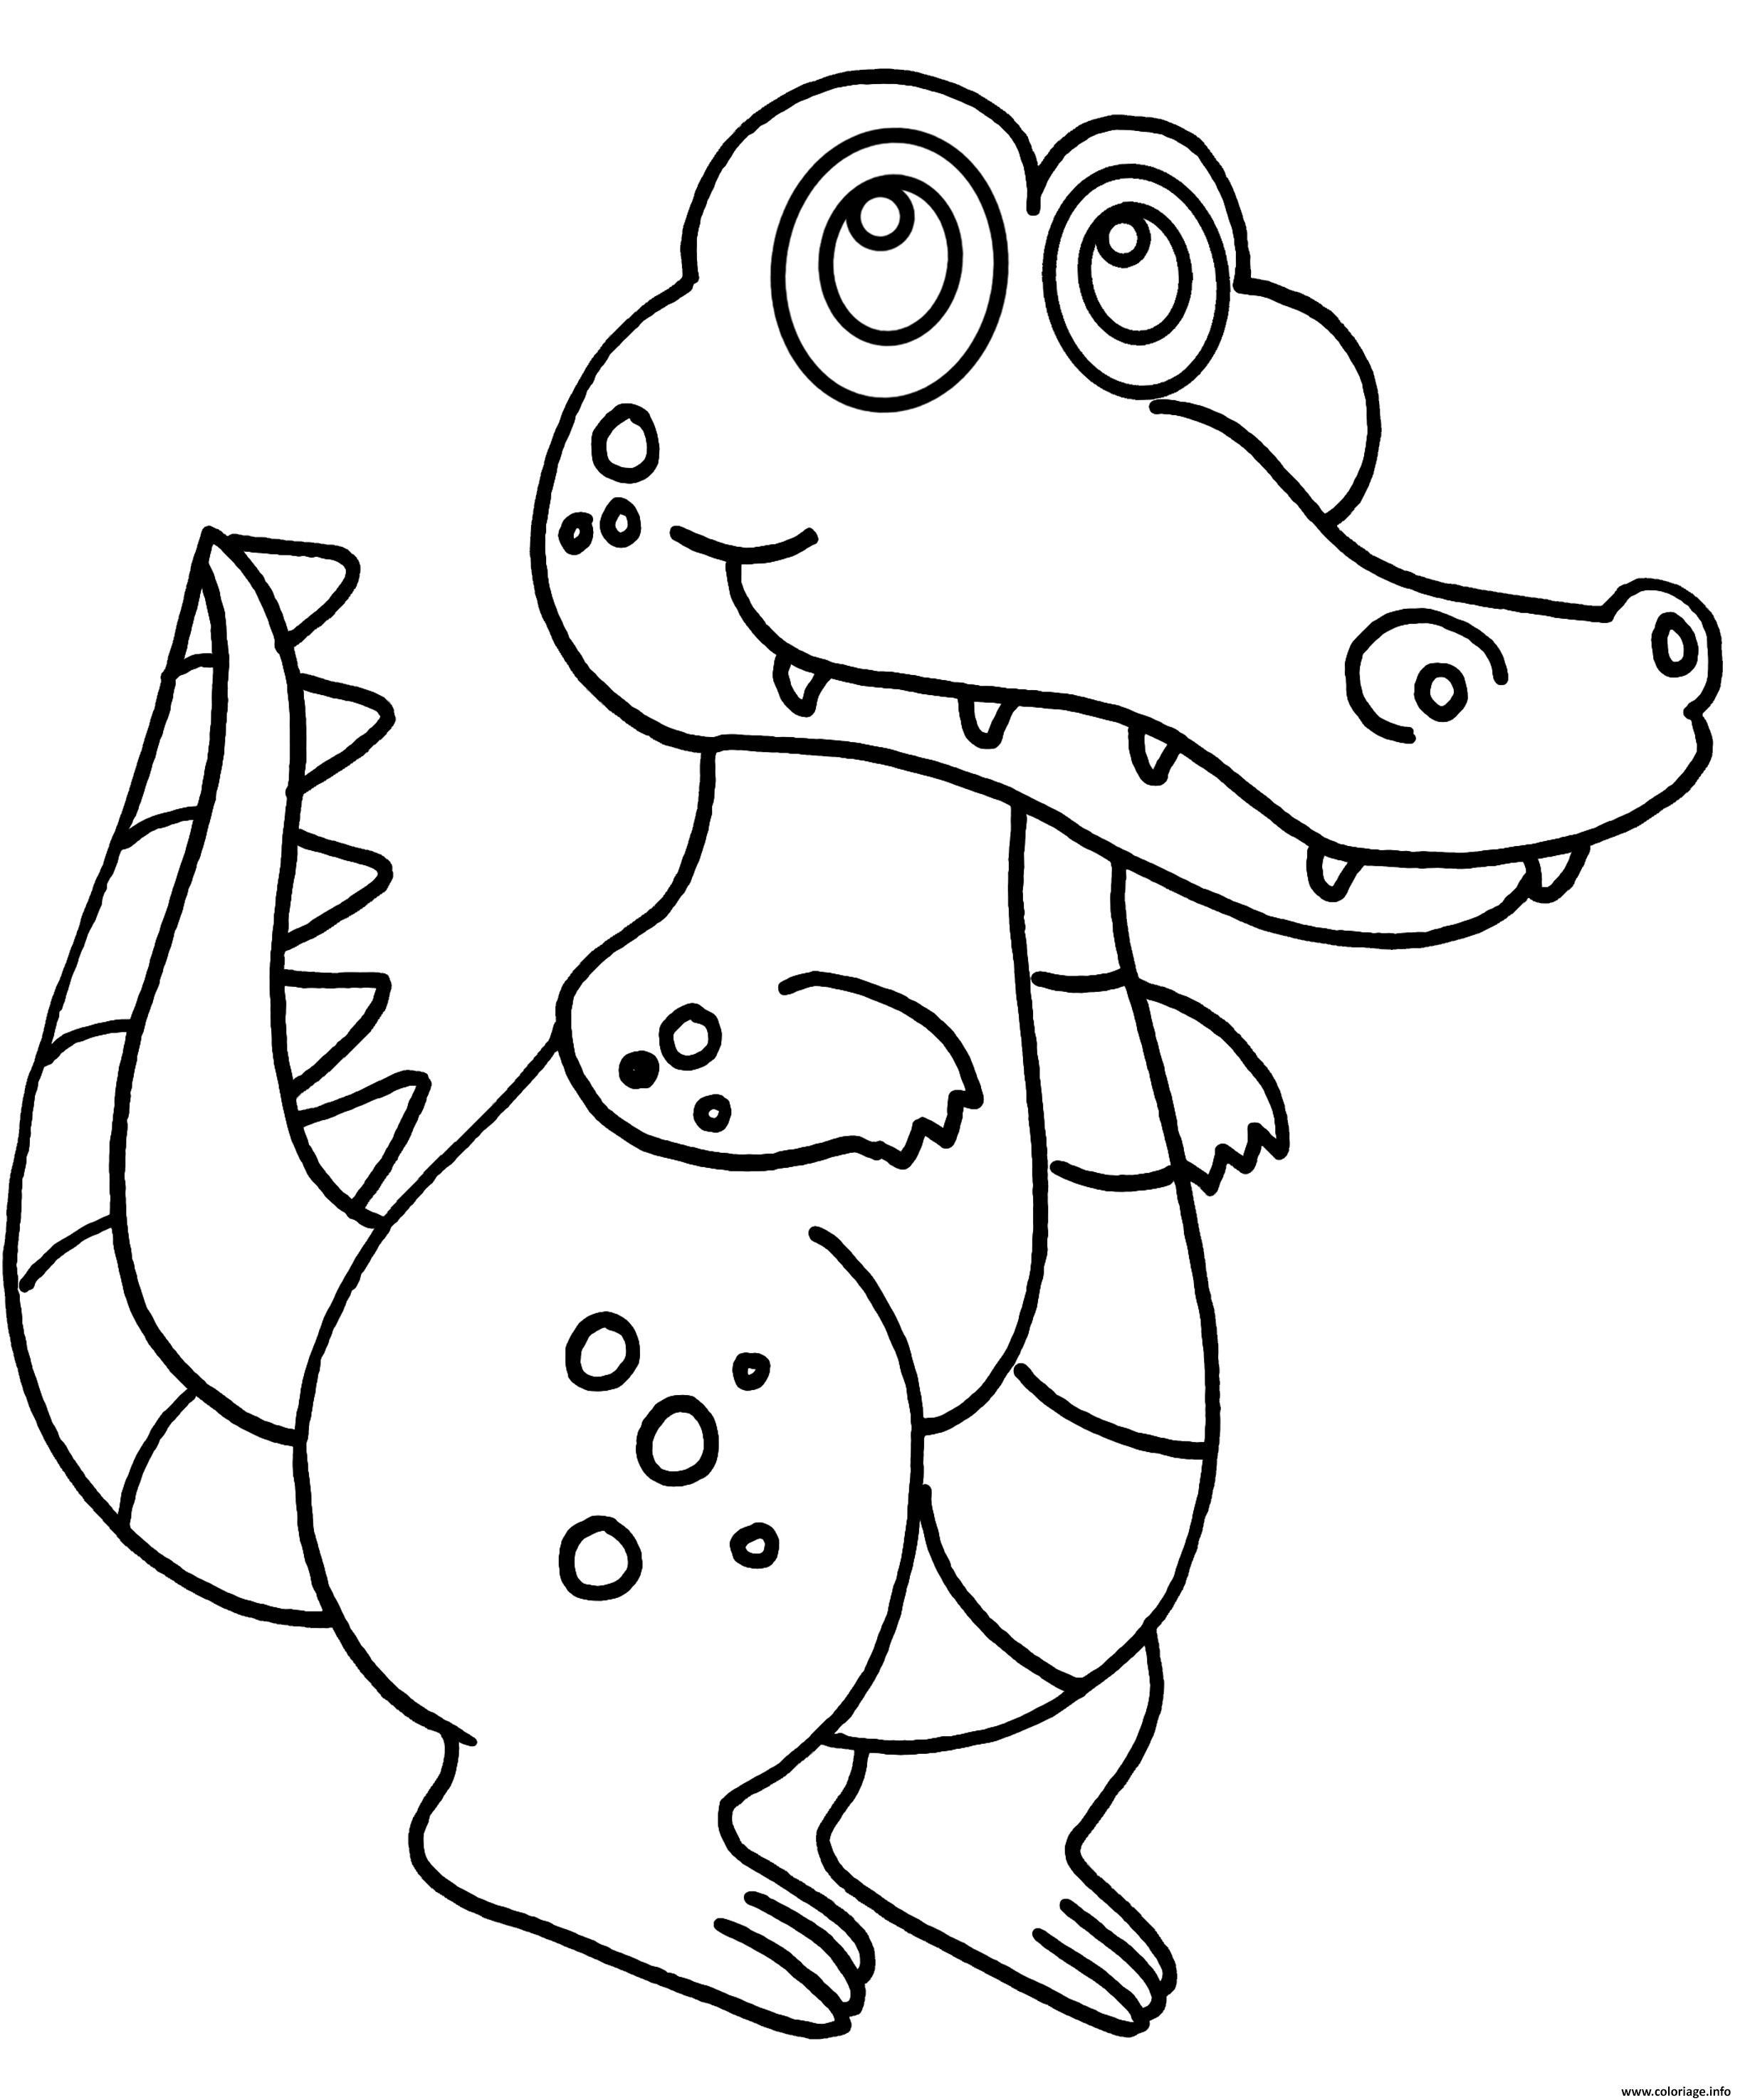 Dessin bebe crocodile marrant Coloriage Gratuit à Imprimer